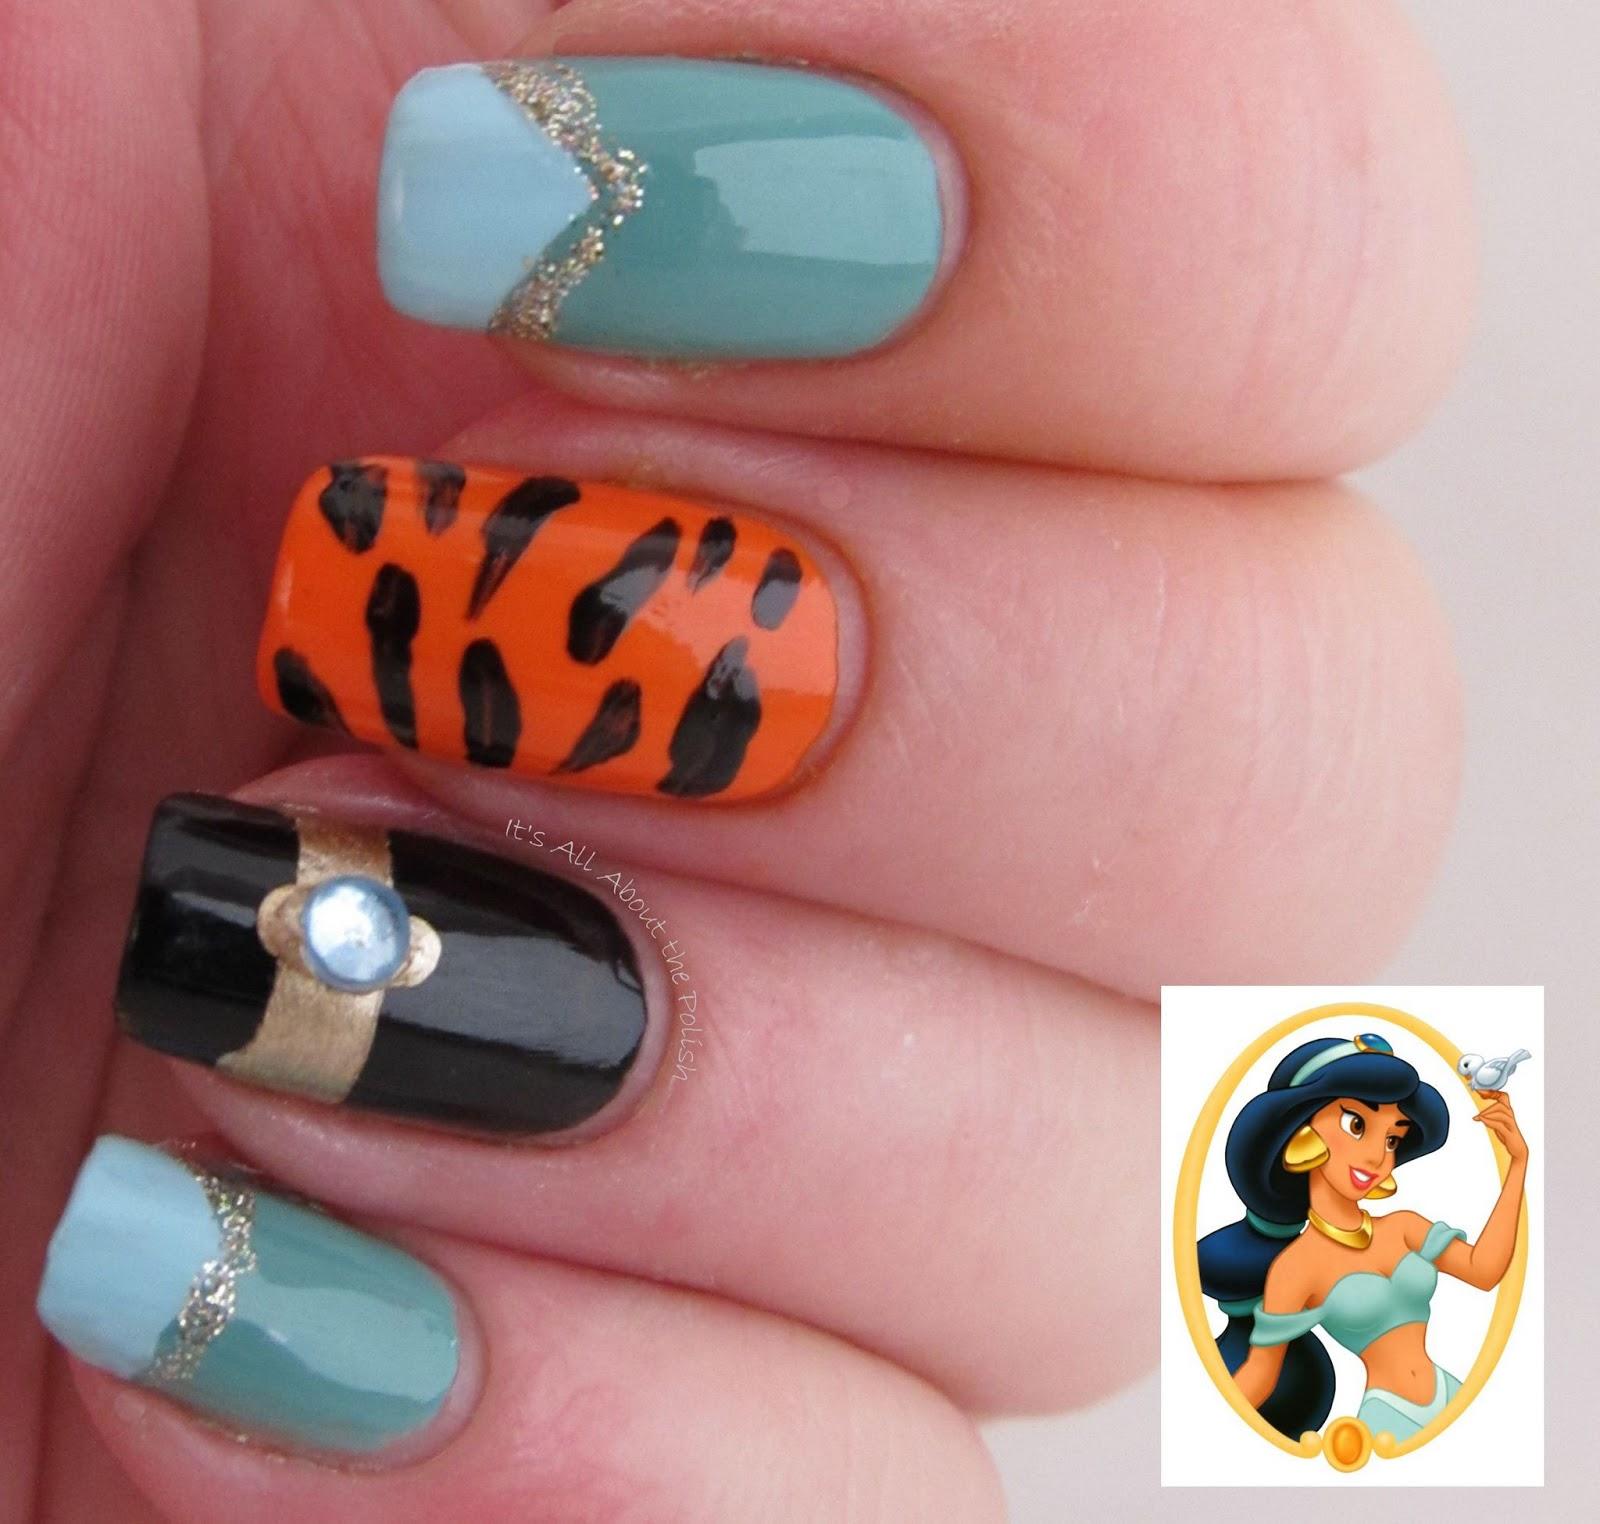 ... All About The Polish: Disney Princess Jasmine Nails - 1600x1524 - jpeg